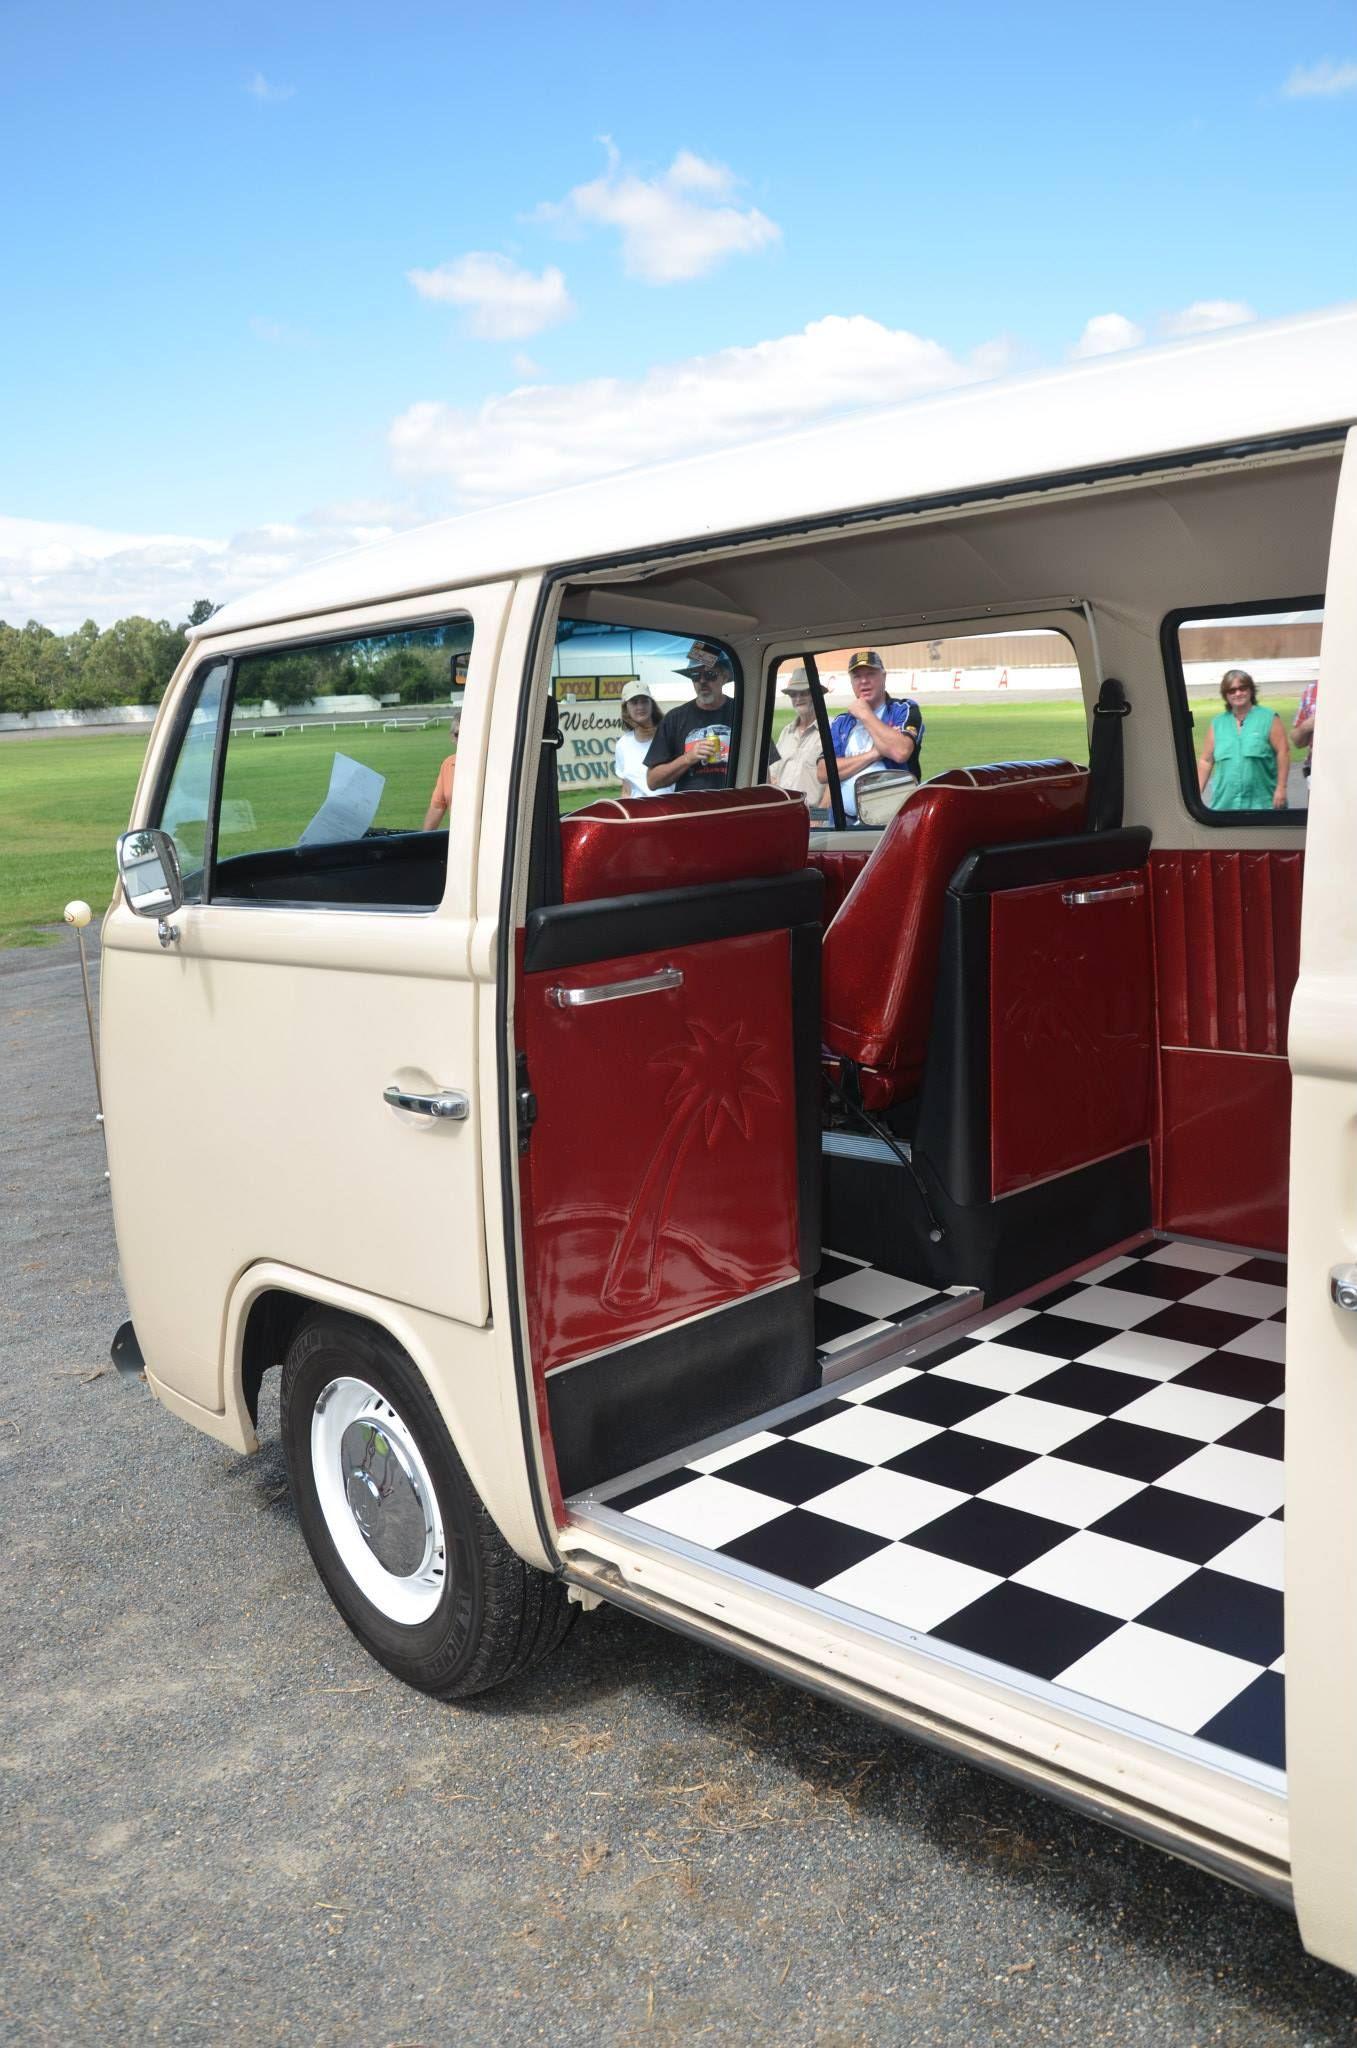 Early Bay Walkthru Passenger Em 2020 Volkswagen Kombi Kombi Personalizada Vans Personalizadas